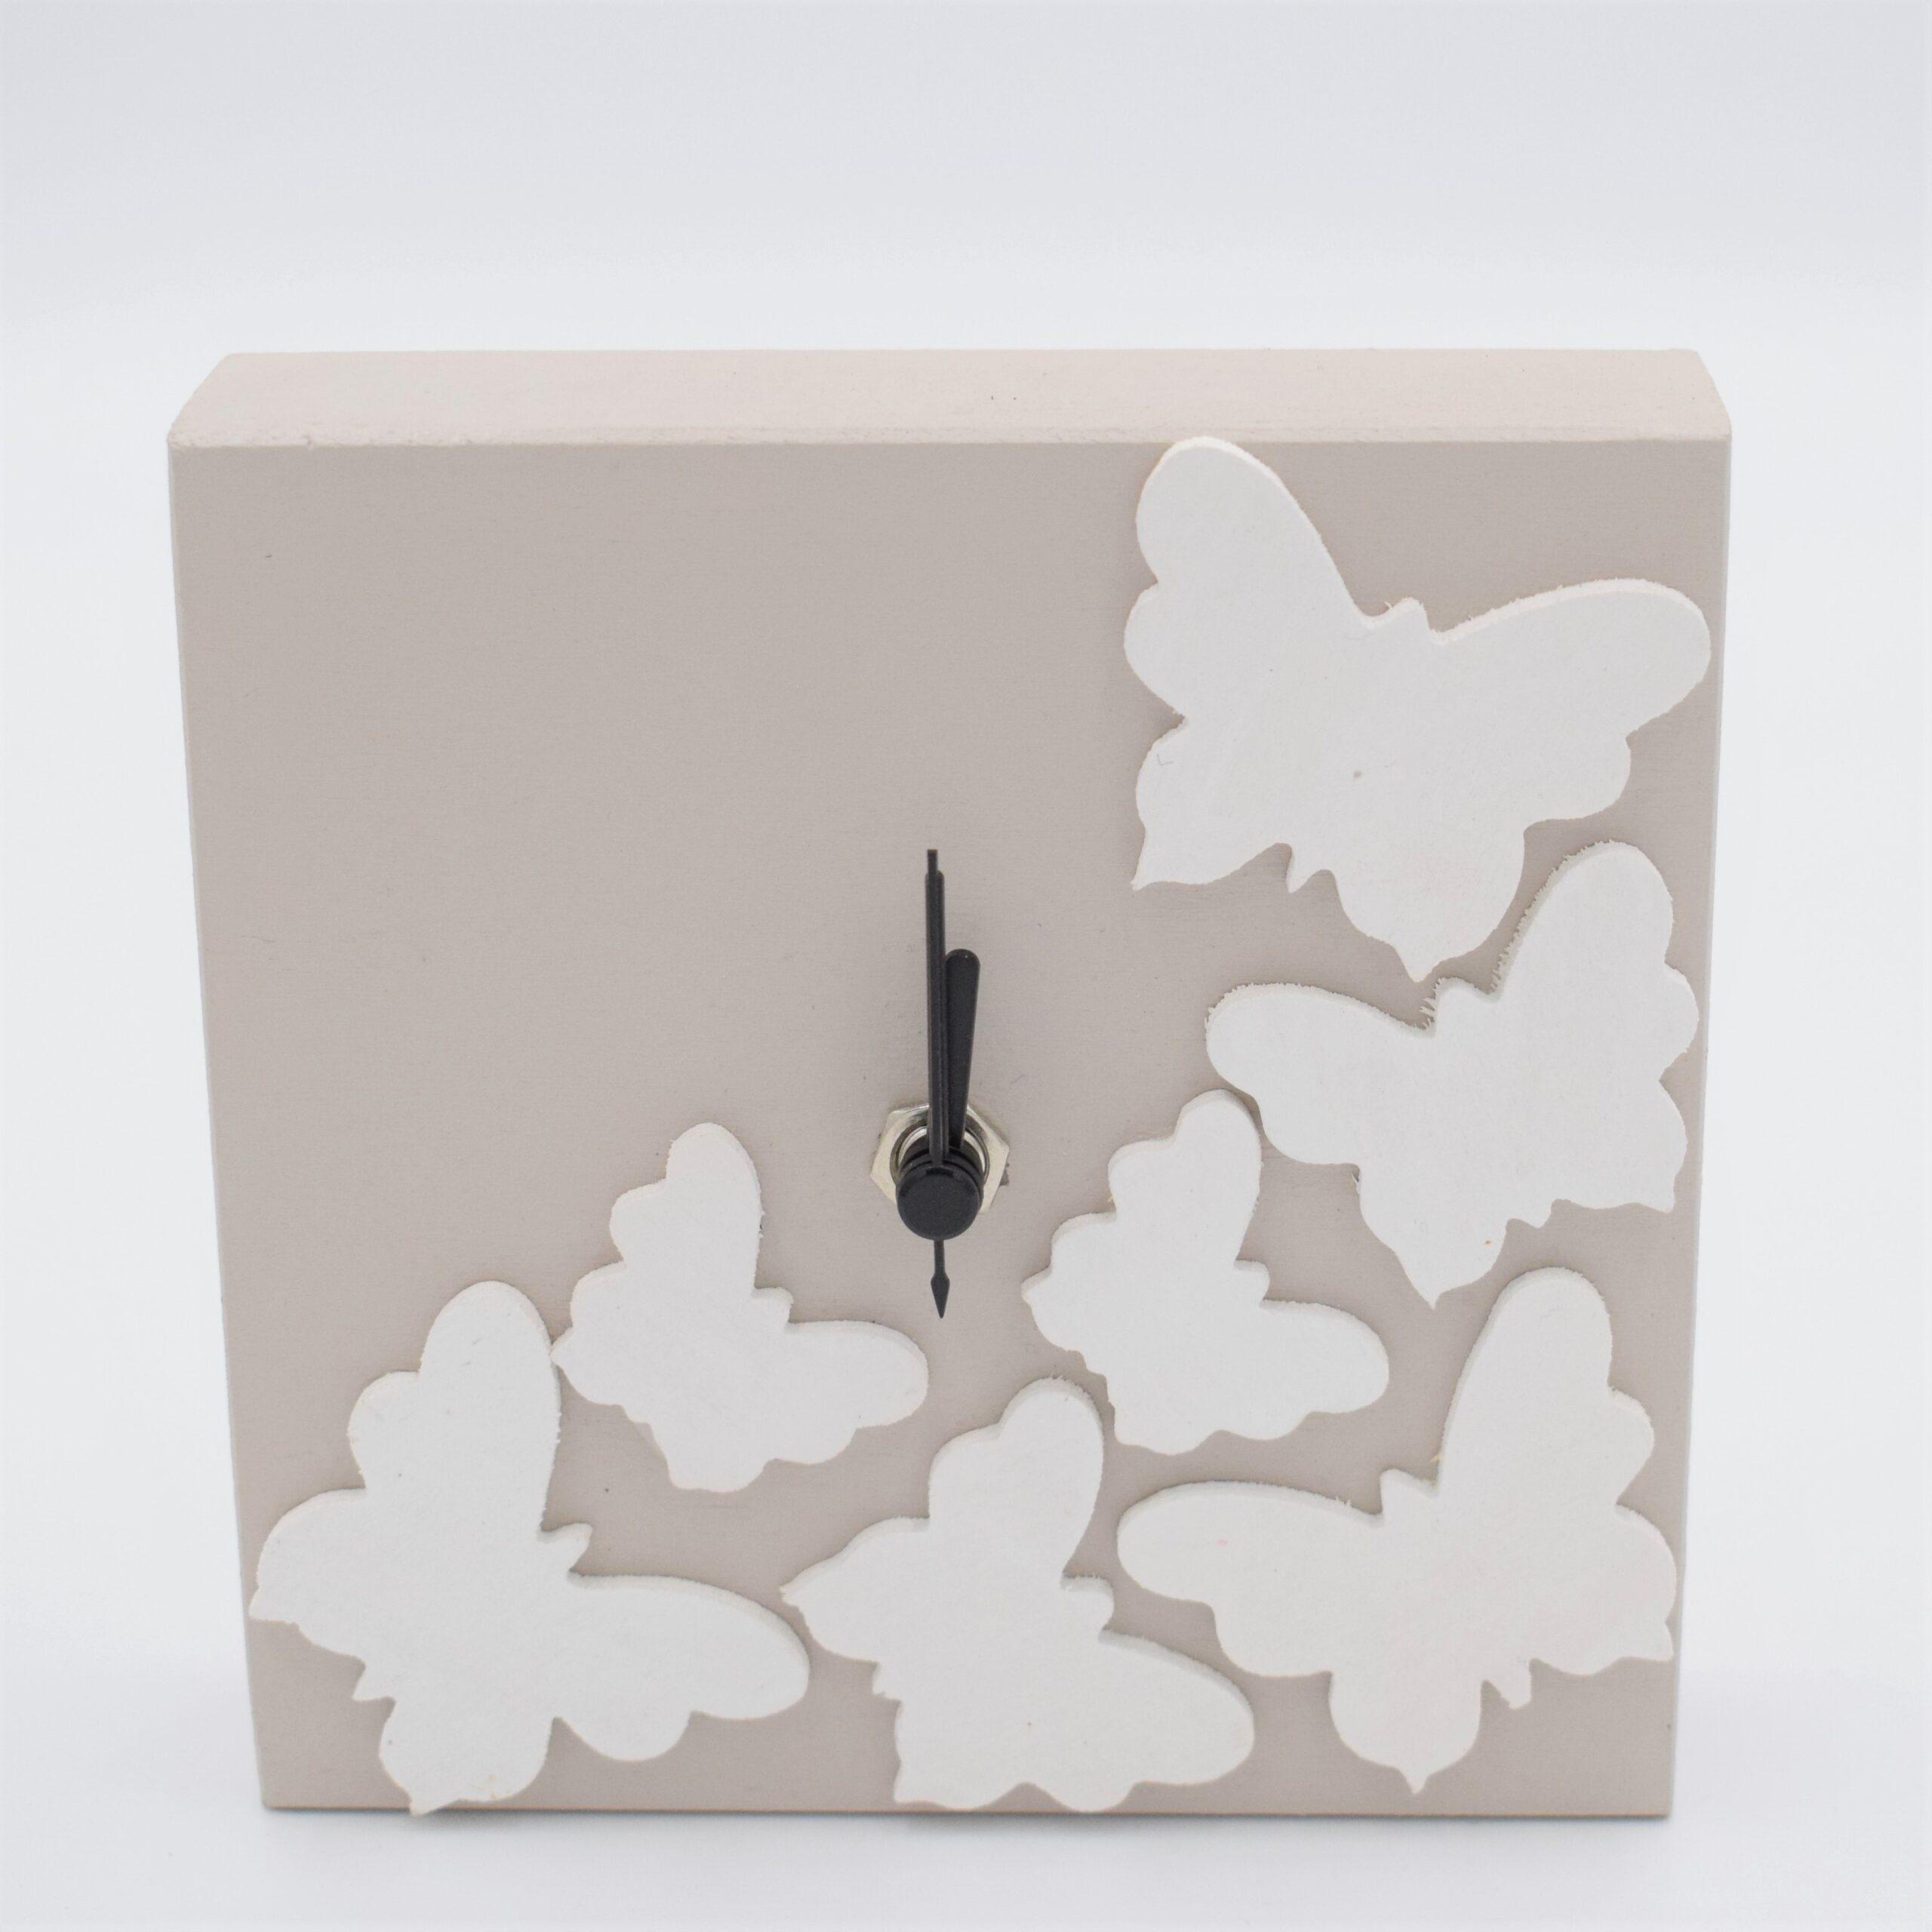 orologio farfalla tortora chiaro e bianco